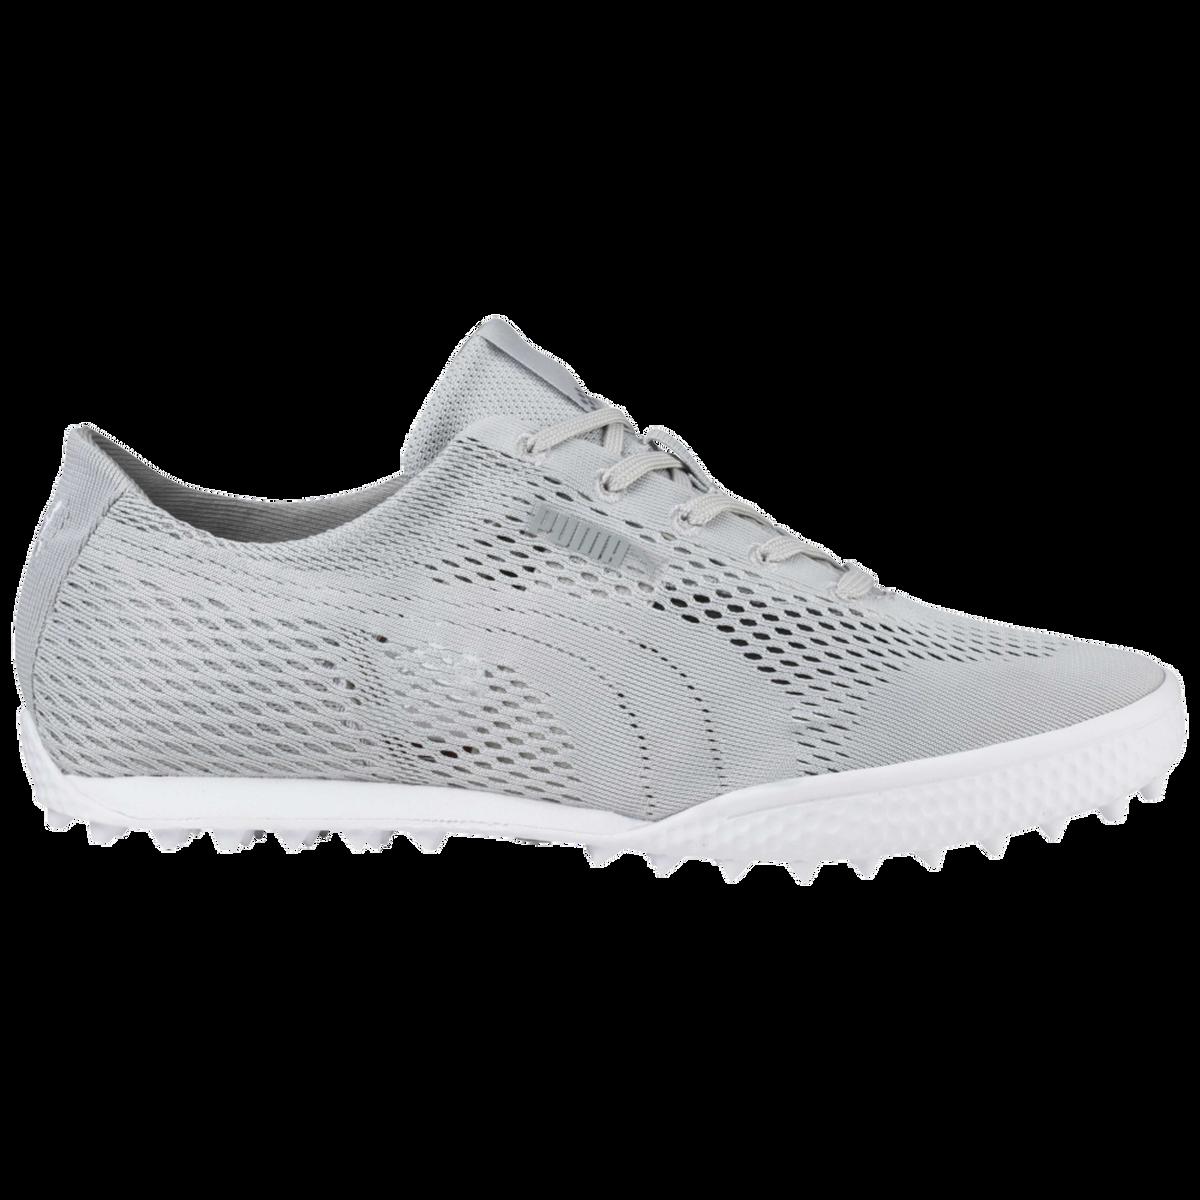 8157a78e608 PUMA Monolite Cat Woven Women s Golf Shoe - Grey